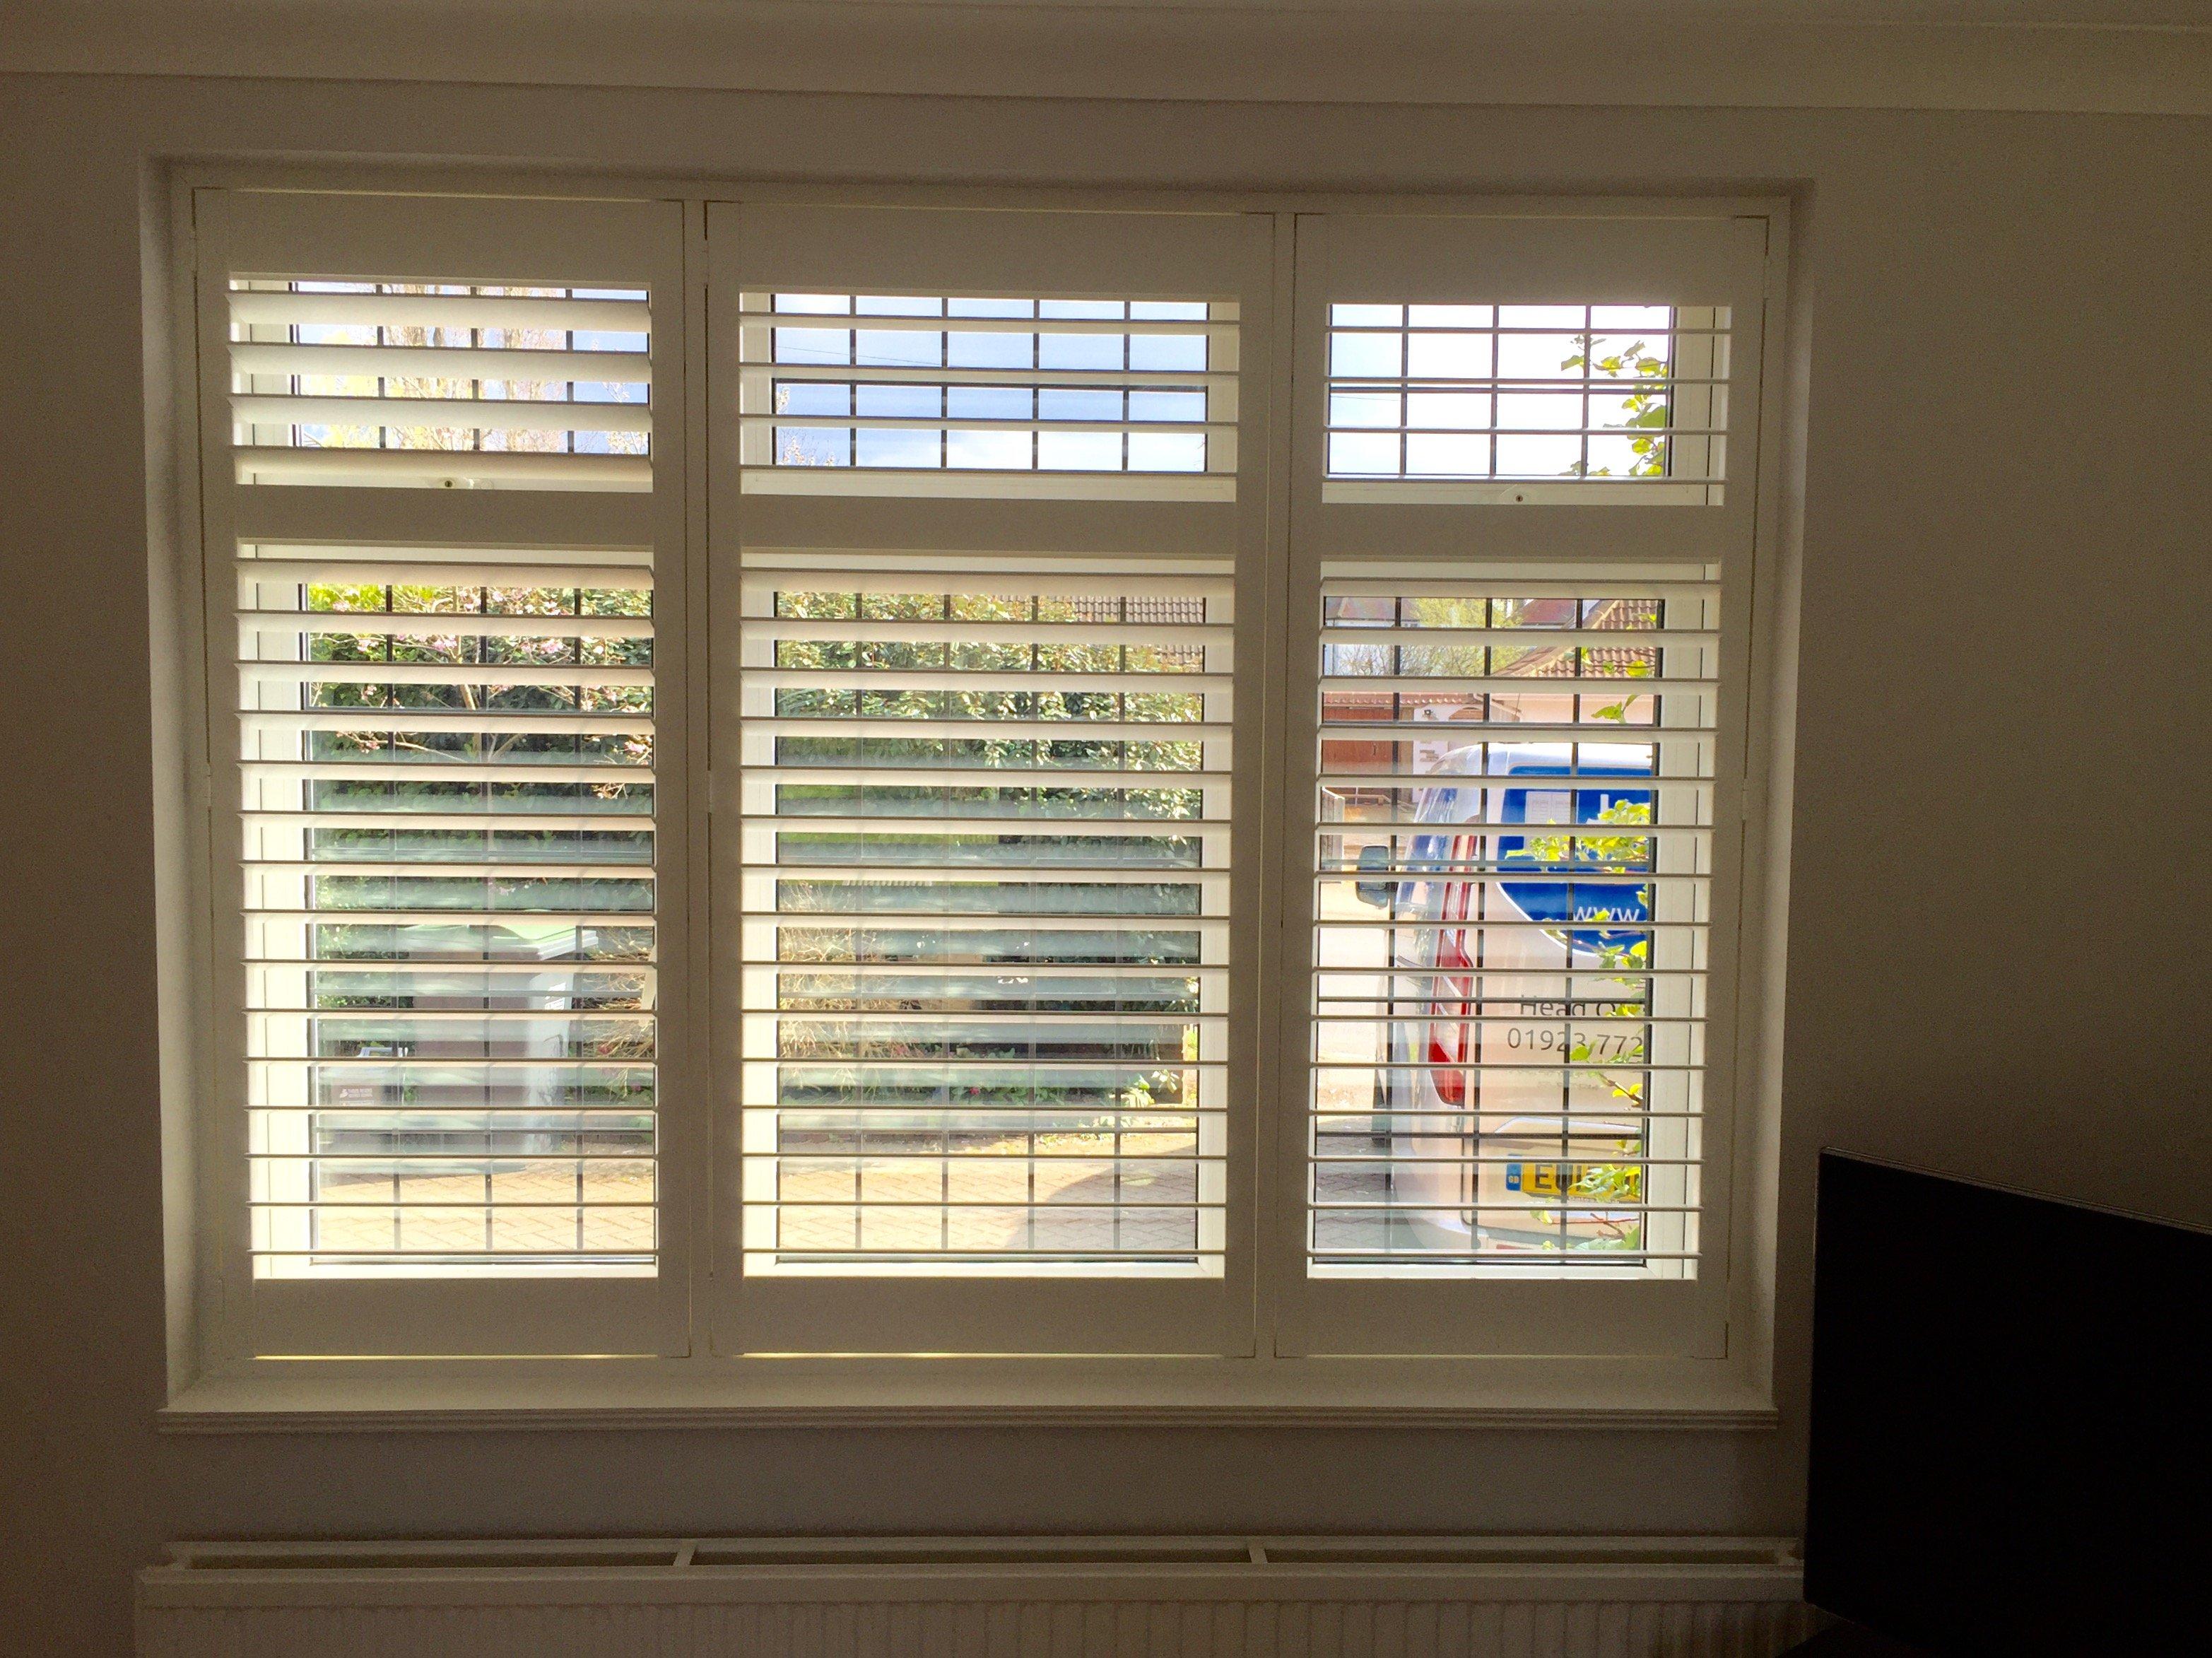 Full height window shutters on bedroom window covering all windows